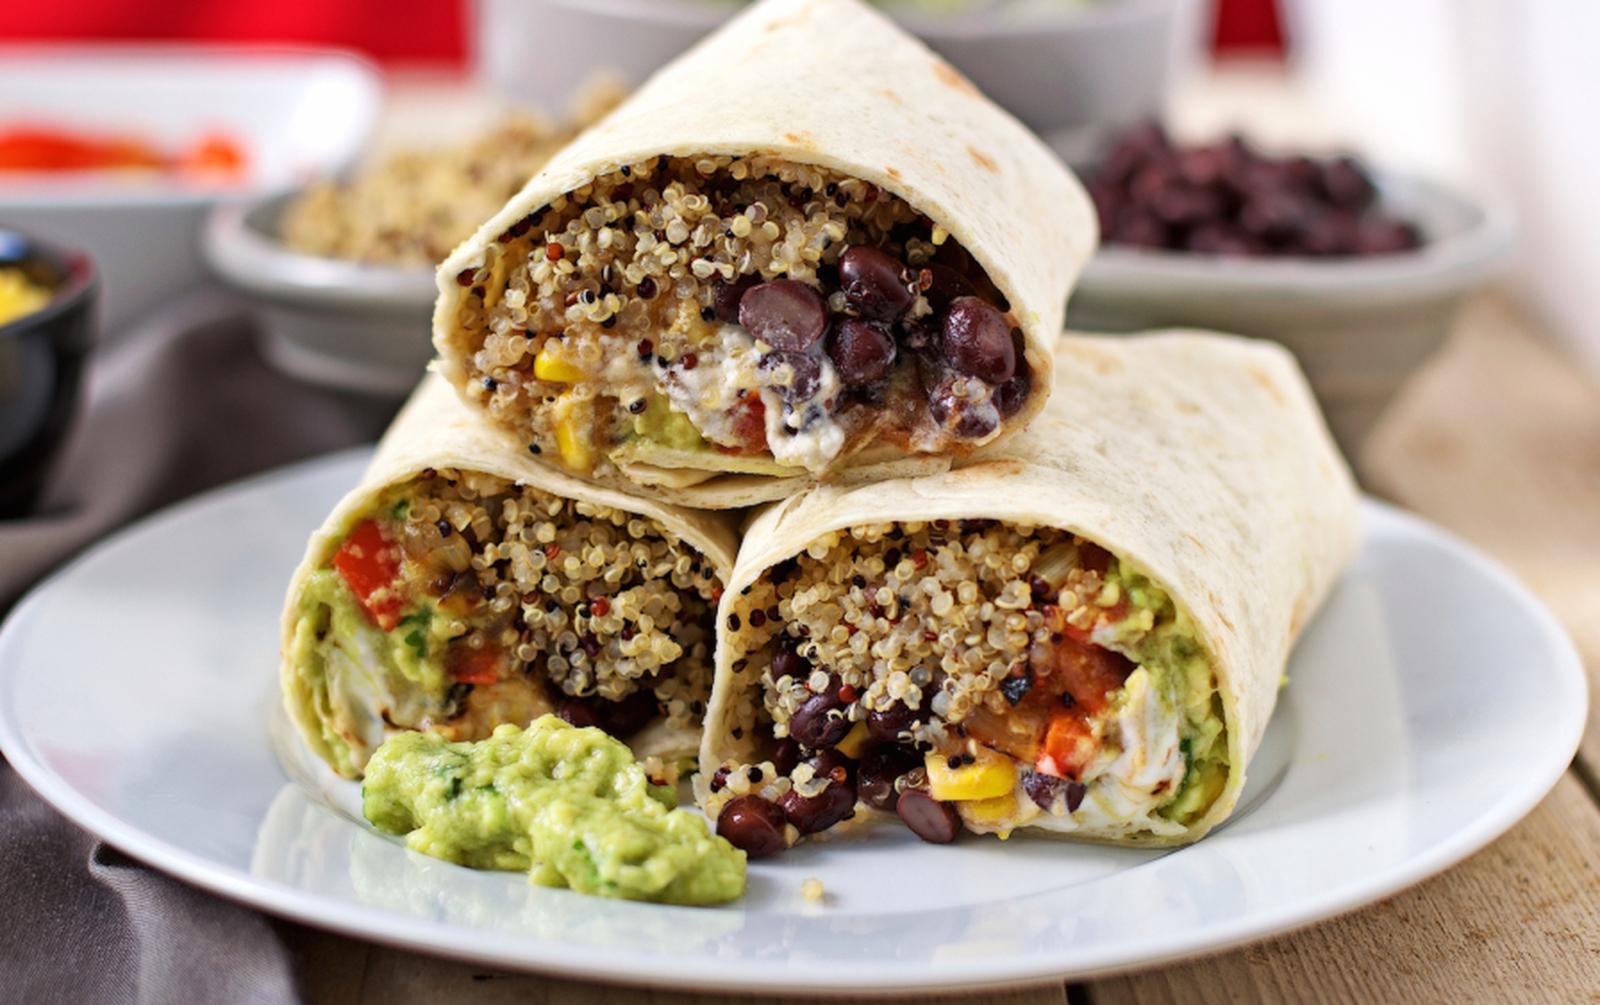 Mexican Quinoa Wraps [Vegan, Gluten-Free]